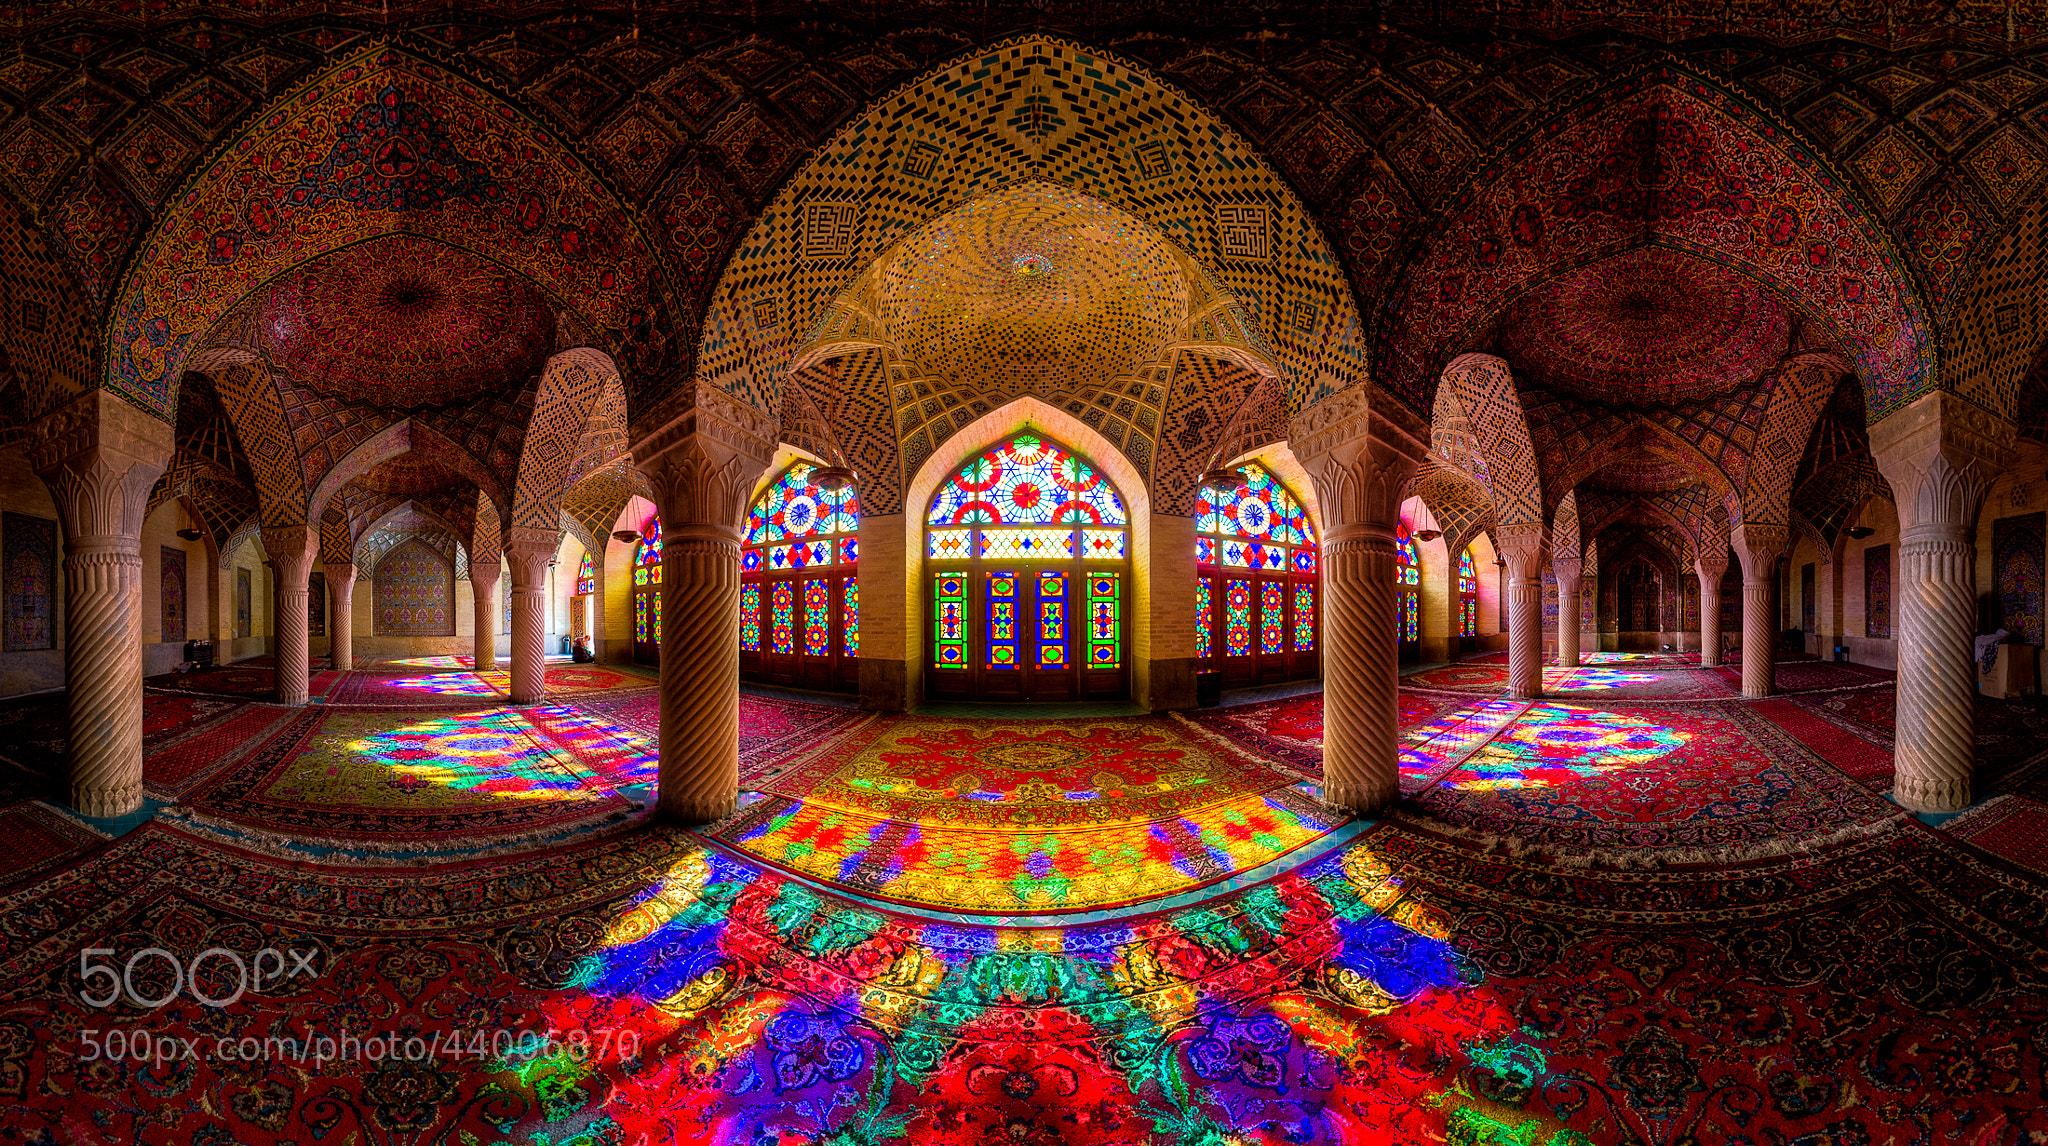 Photograph Nasir Al-Mulk Mosque Panorama by Mohammad Reza Domiri Ganji on 500px